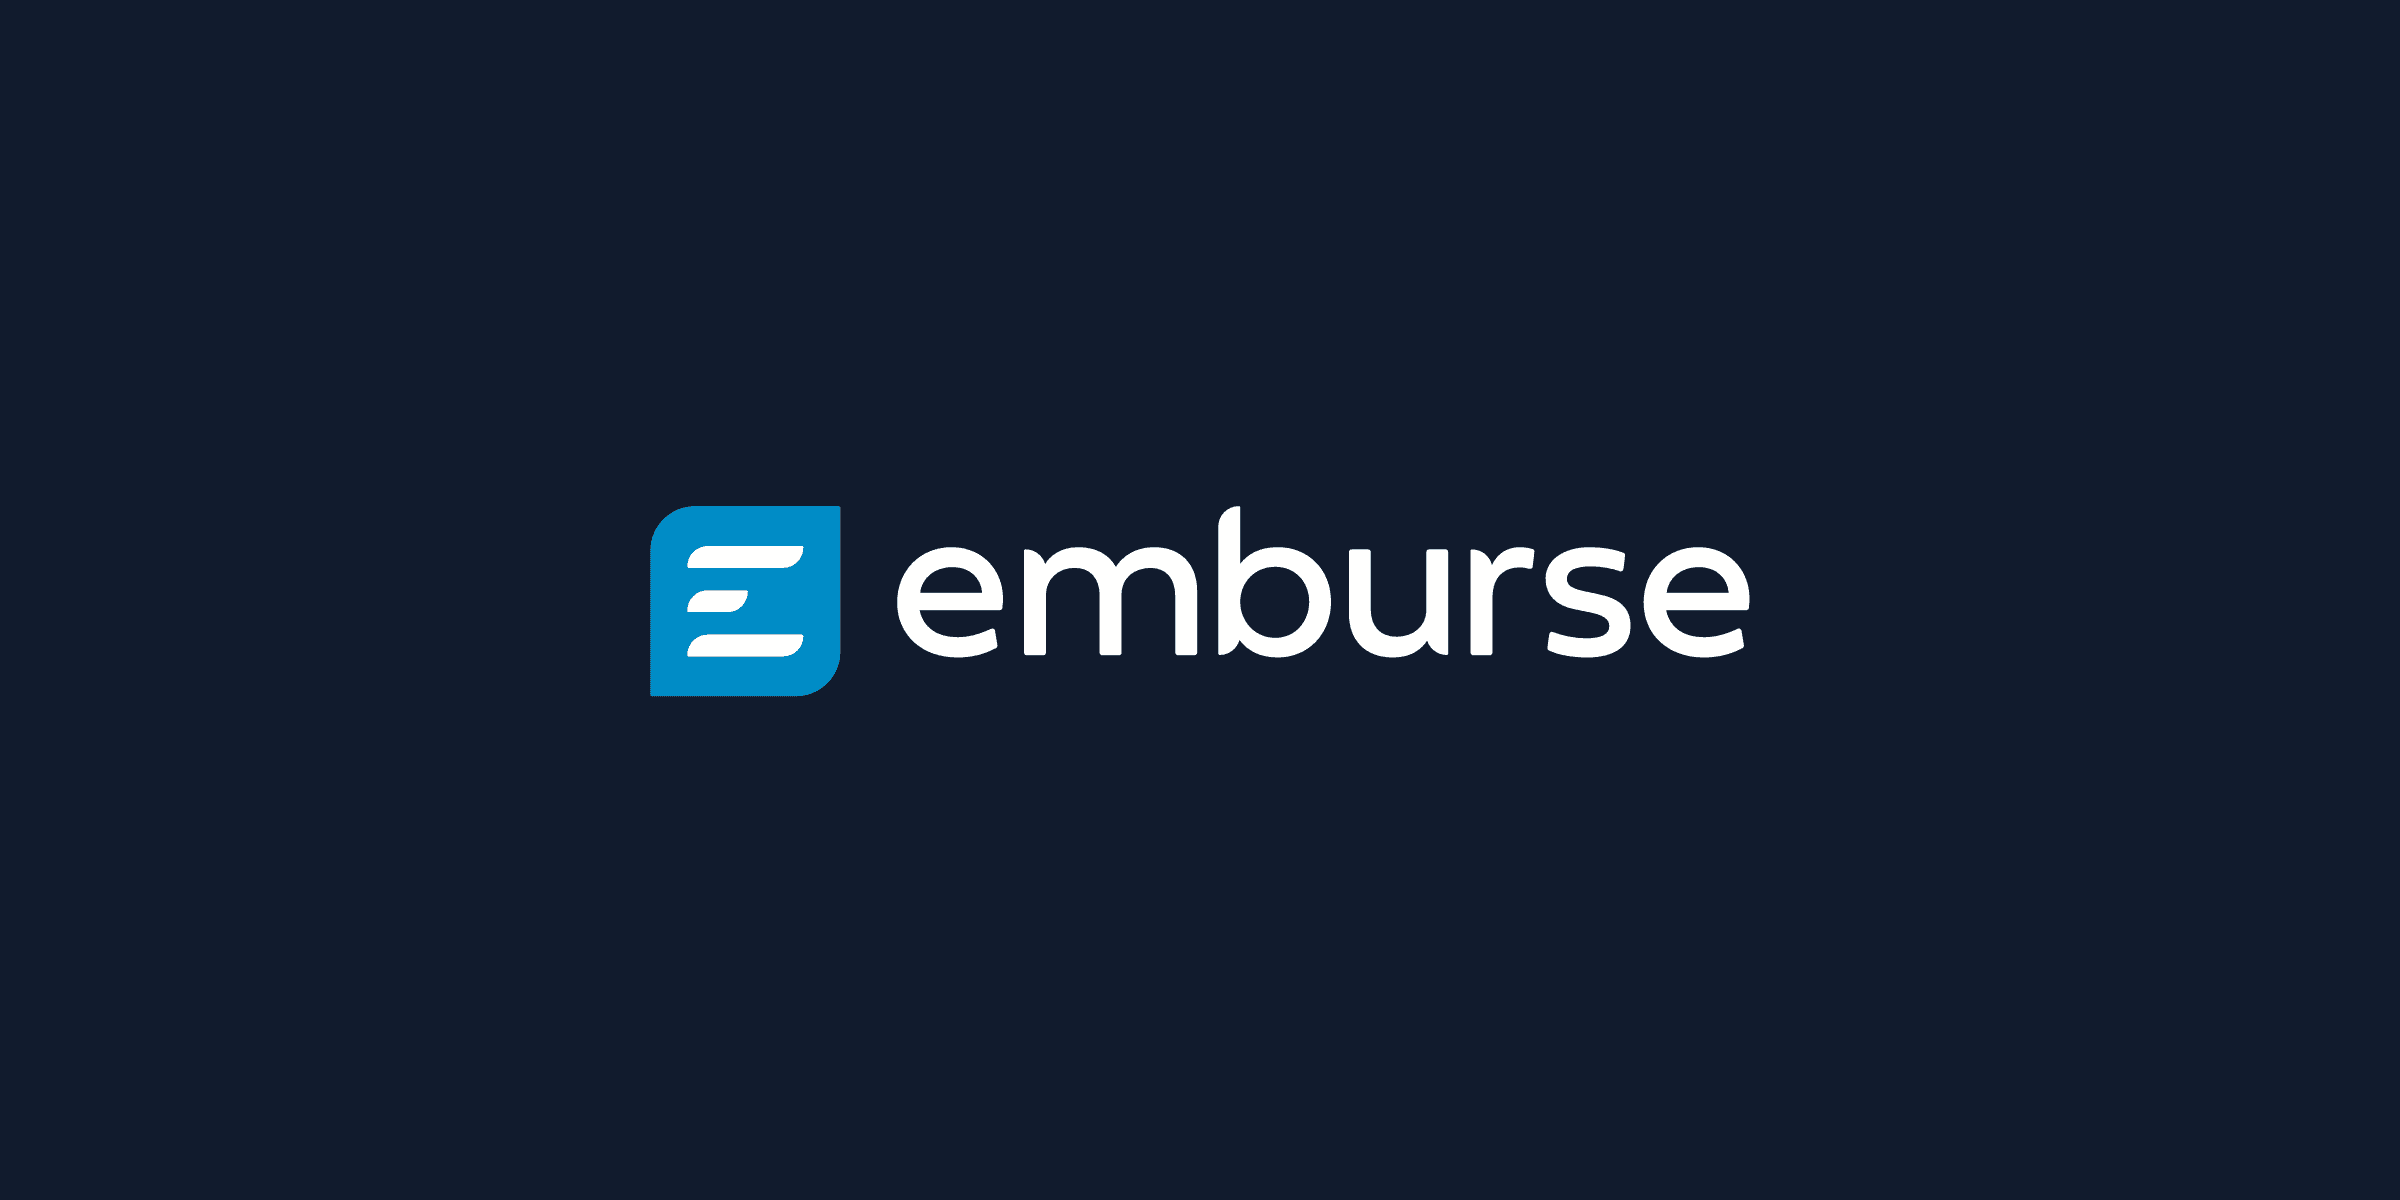 Nace Emburse, la nueva empresa global que incorpora Abacus, Captio, Certify, Chrome River, Nexonia y Tallie